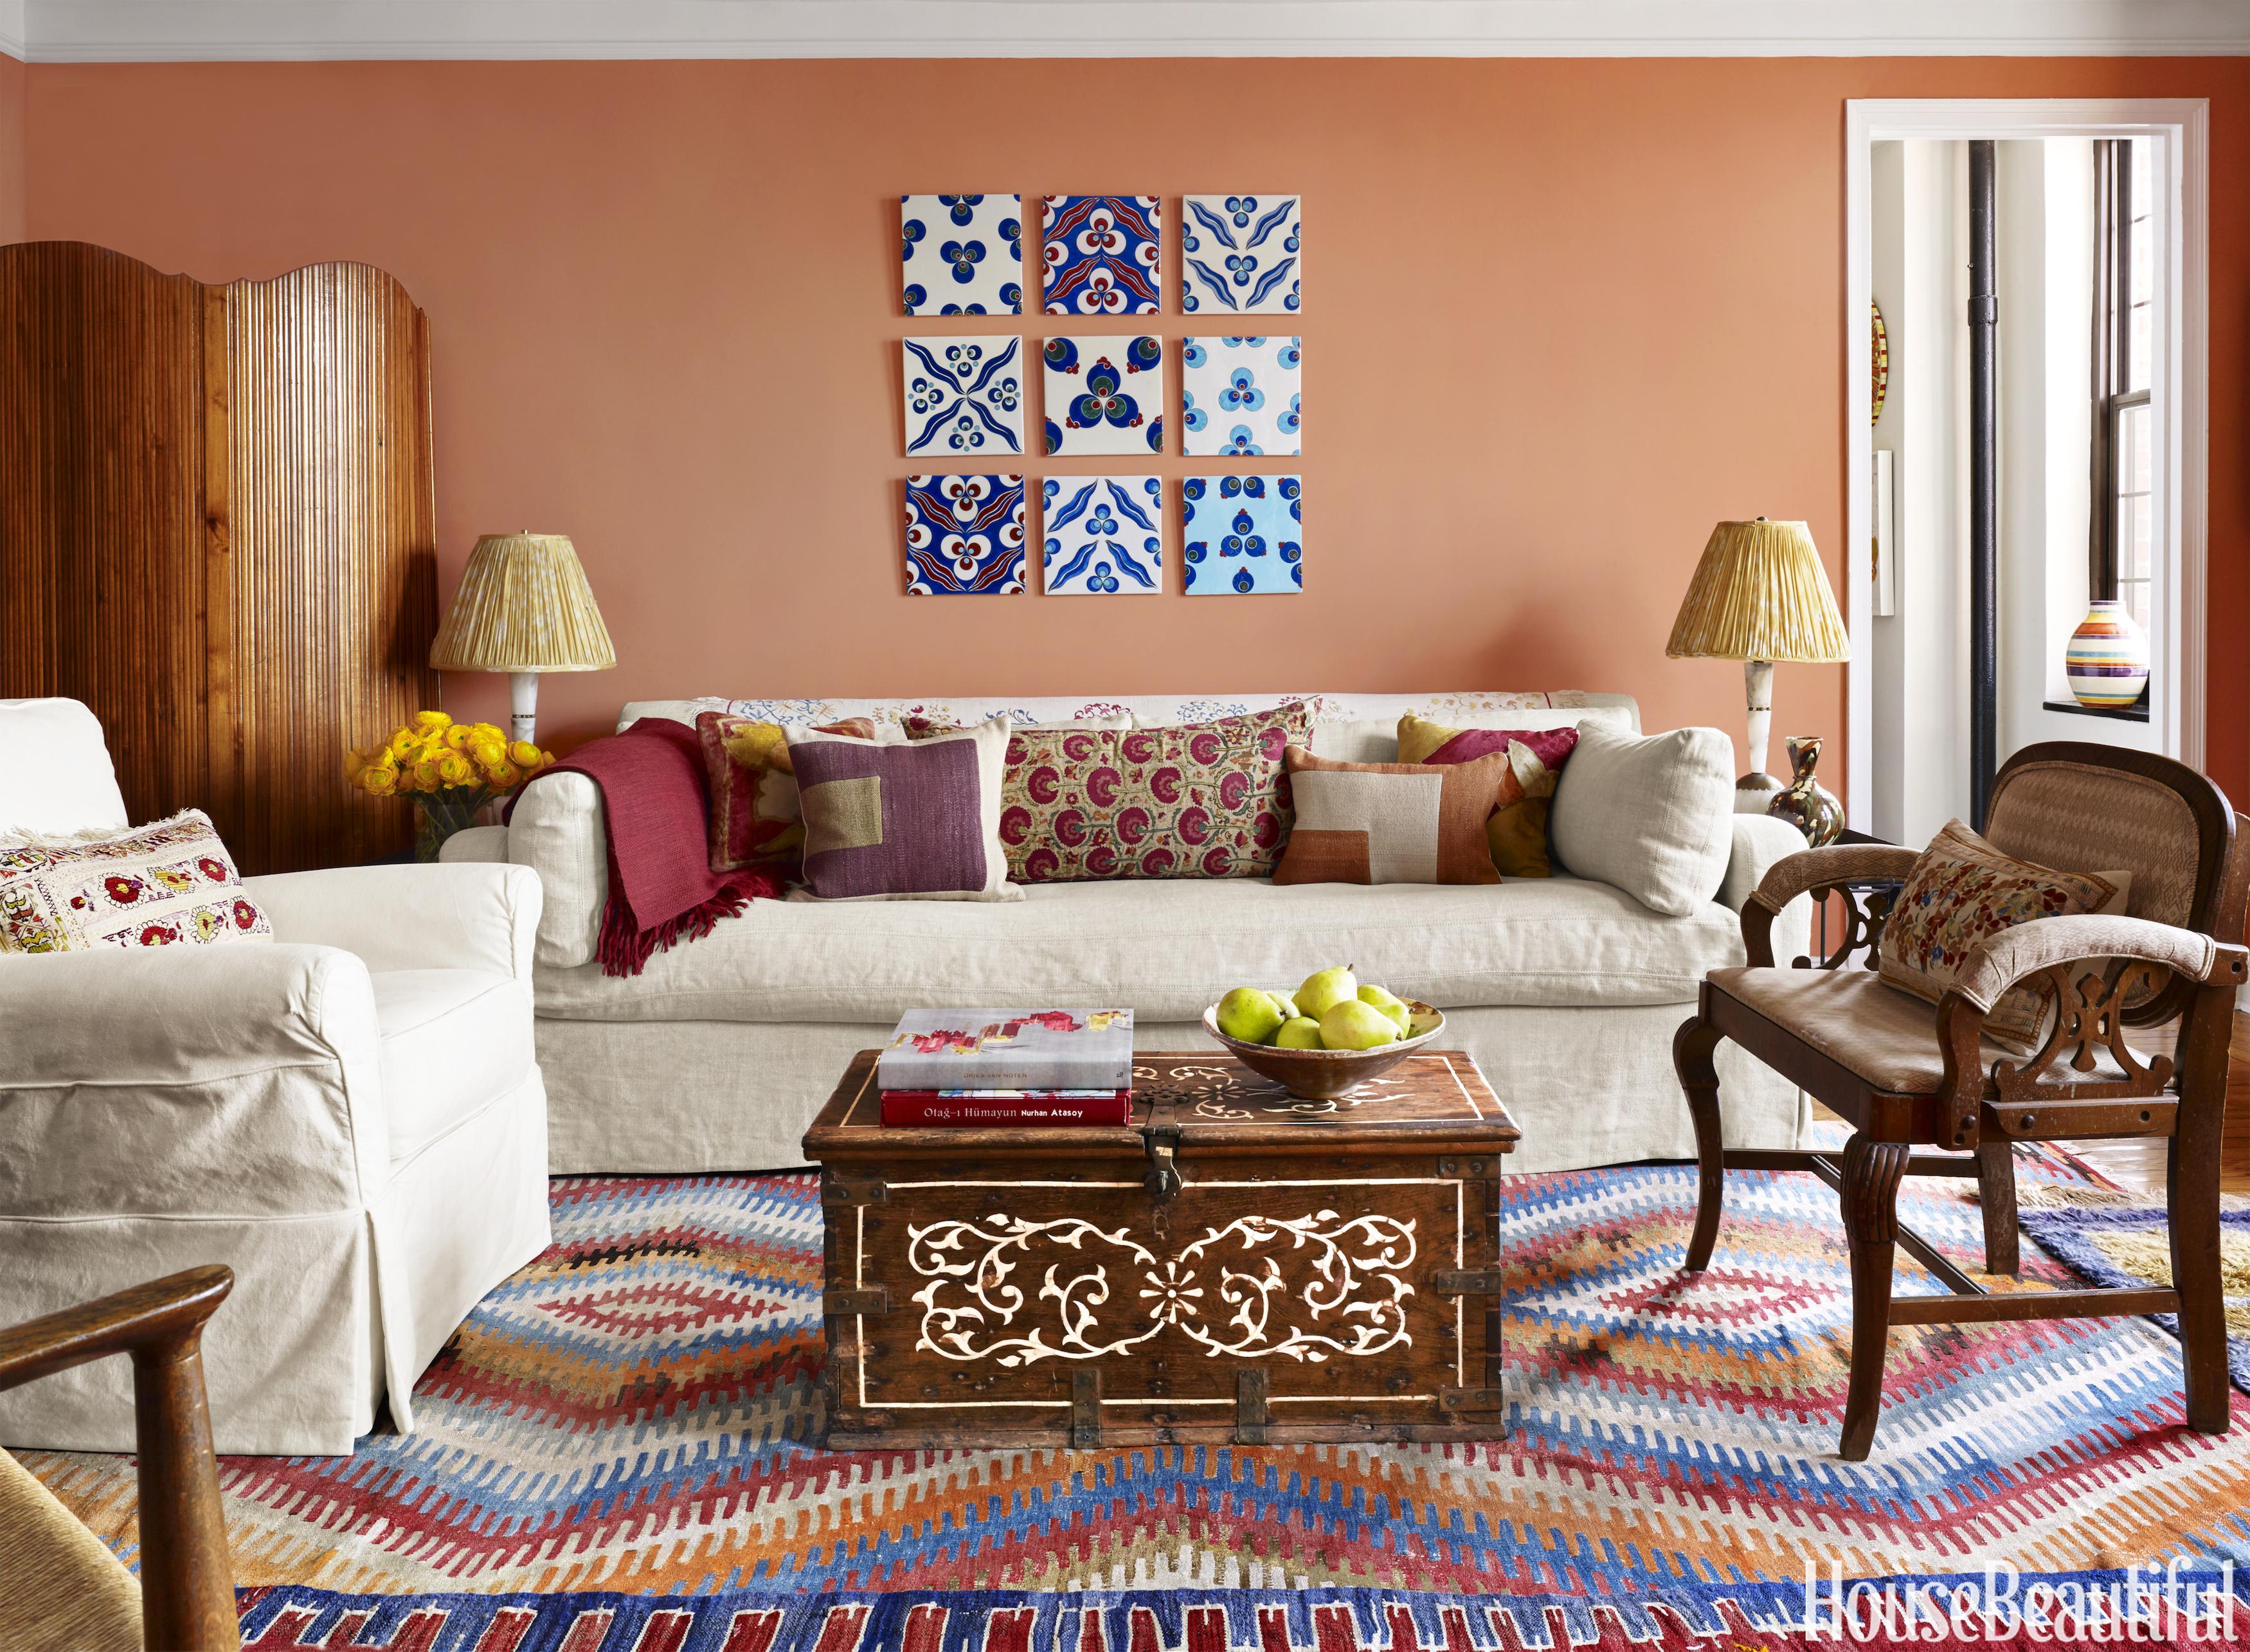 Sara bengur 39 s manhattan apartment global decorating ideas for Manhattan tan paint color